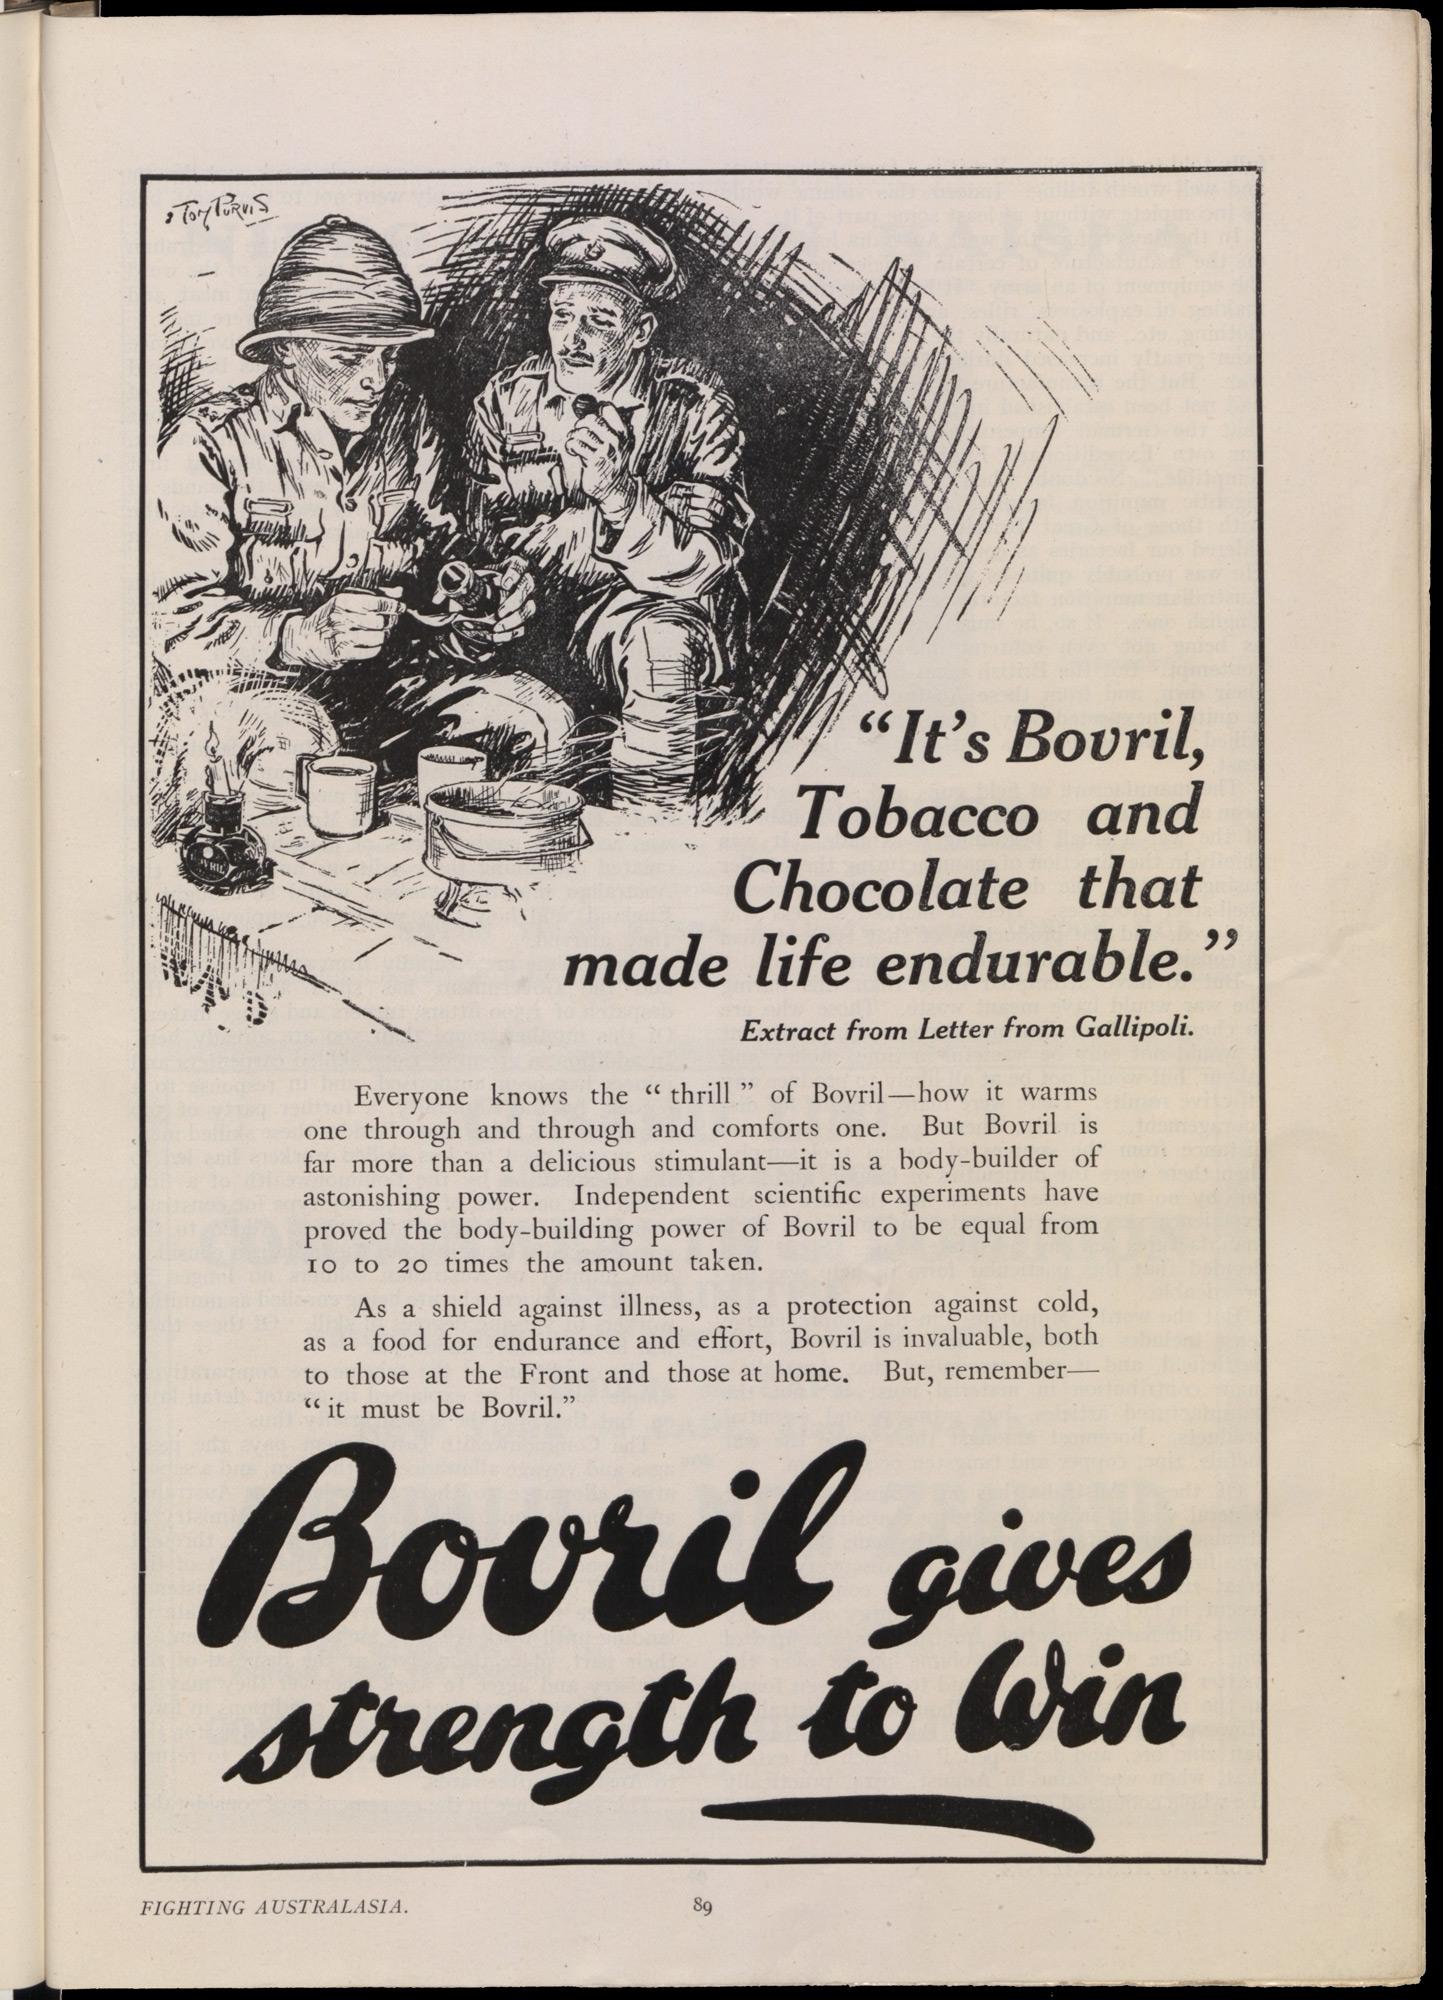 Advert for Bovril